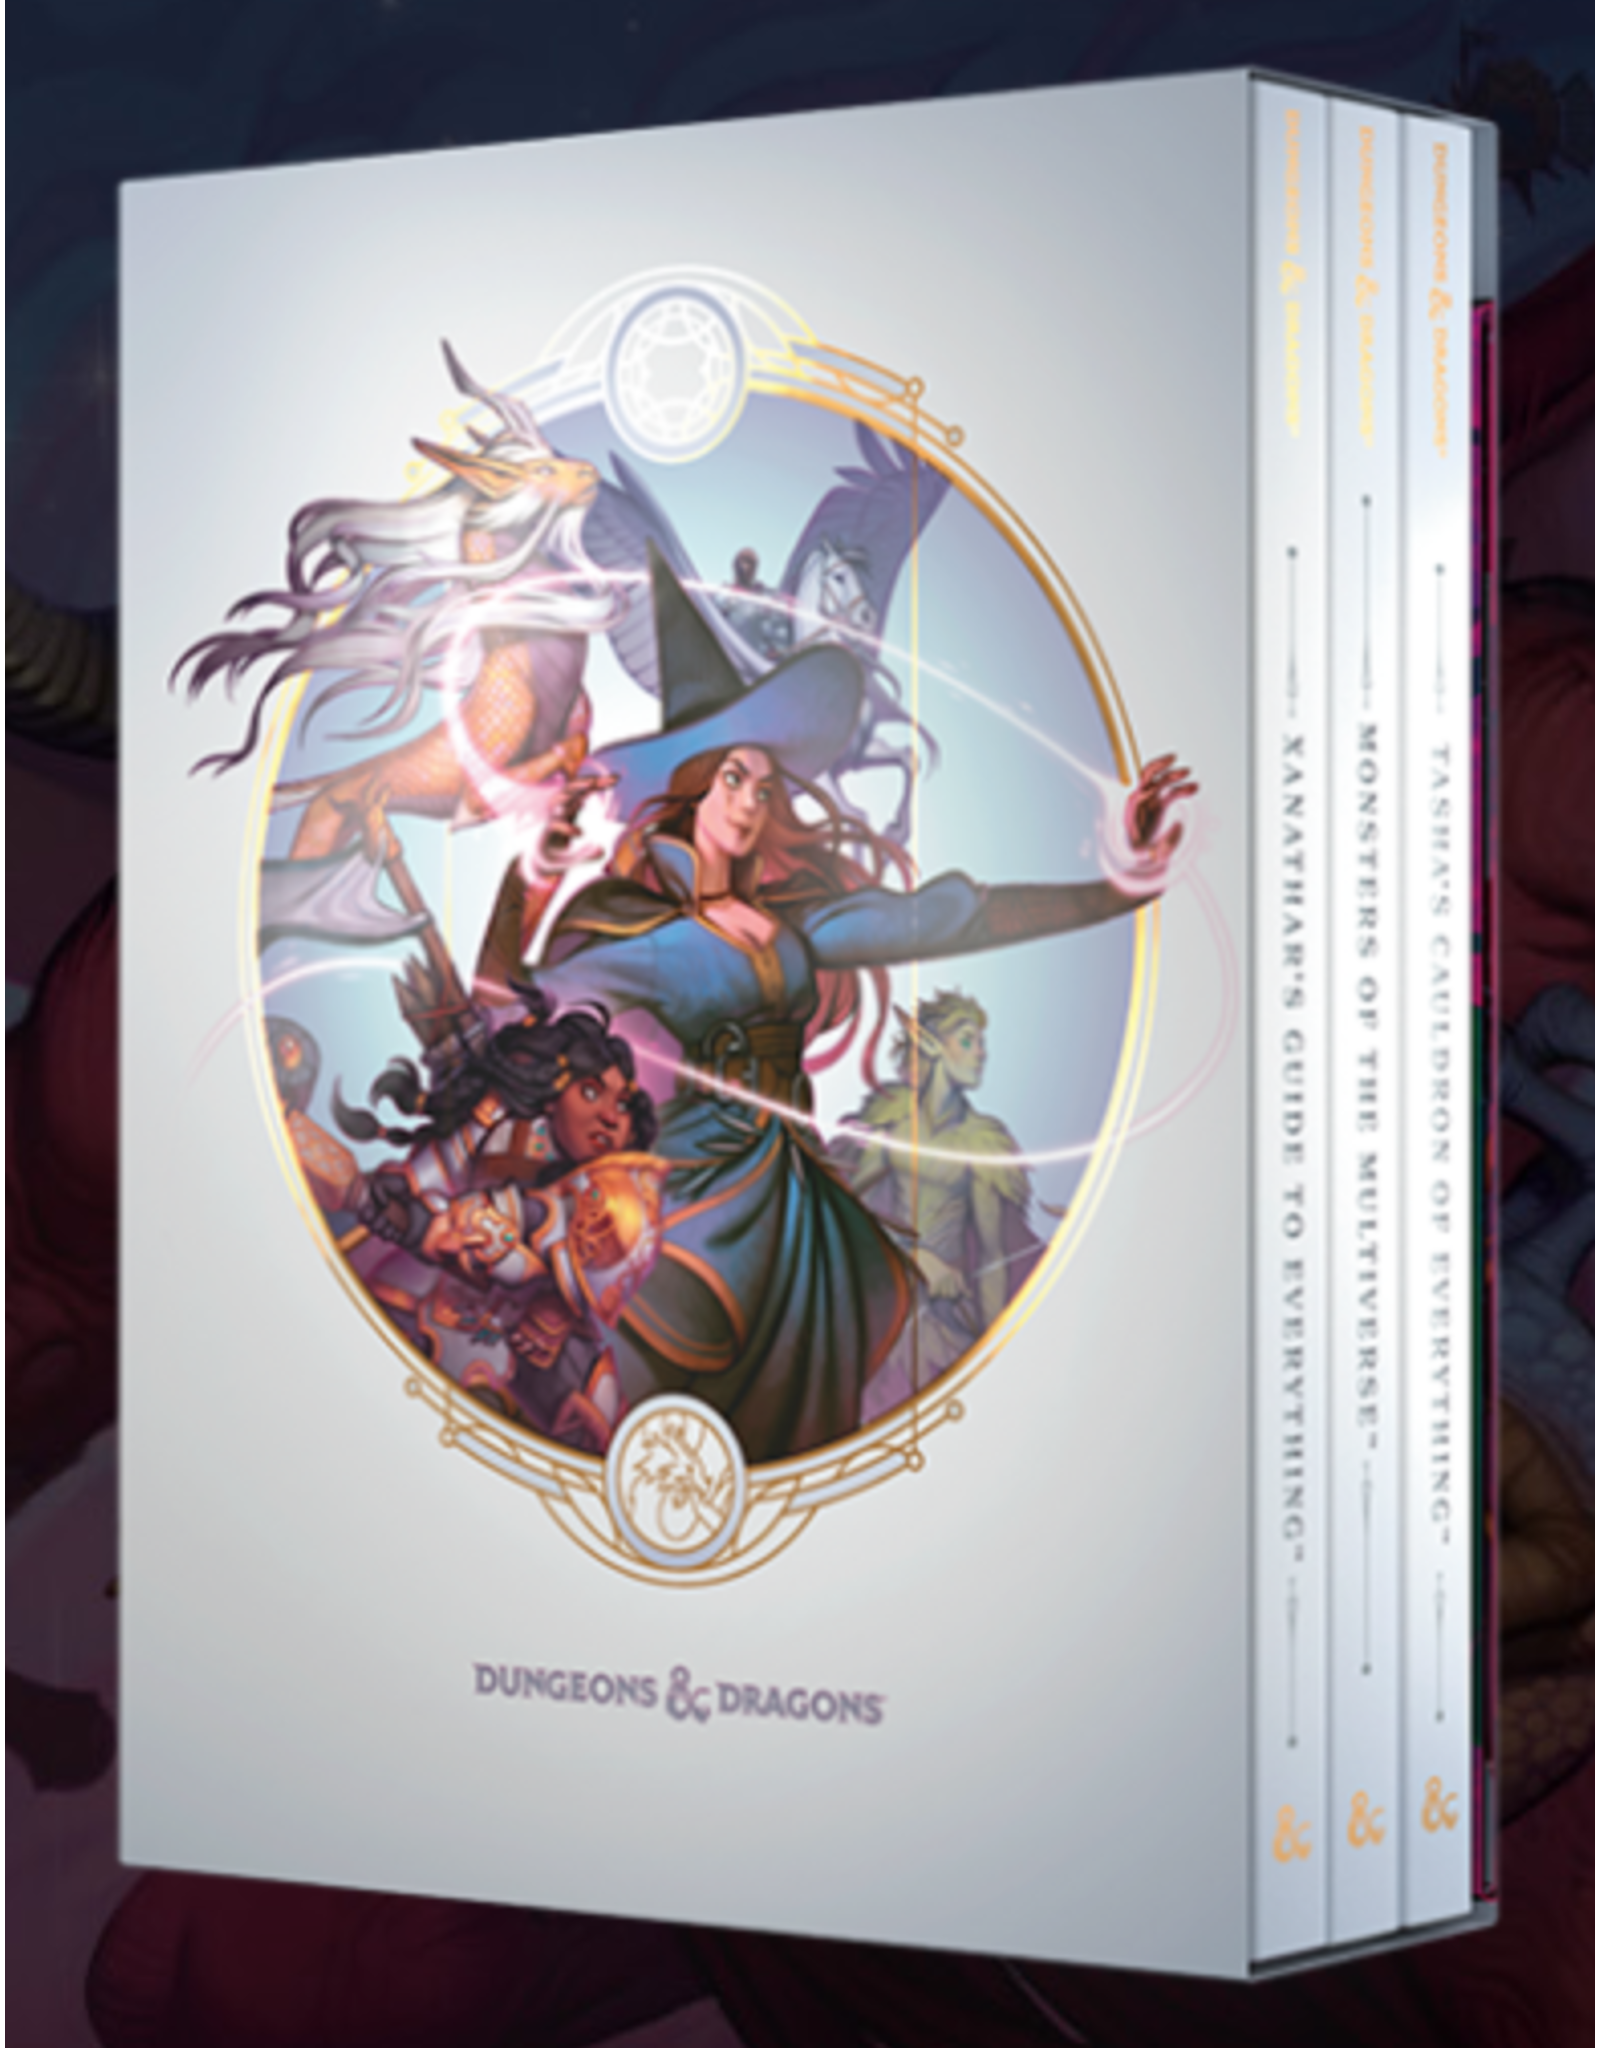 Dungeons & Dragons D&D 5e: Rules Expansion Gift Set (Alt Art)  (January Pre Order)